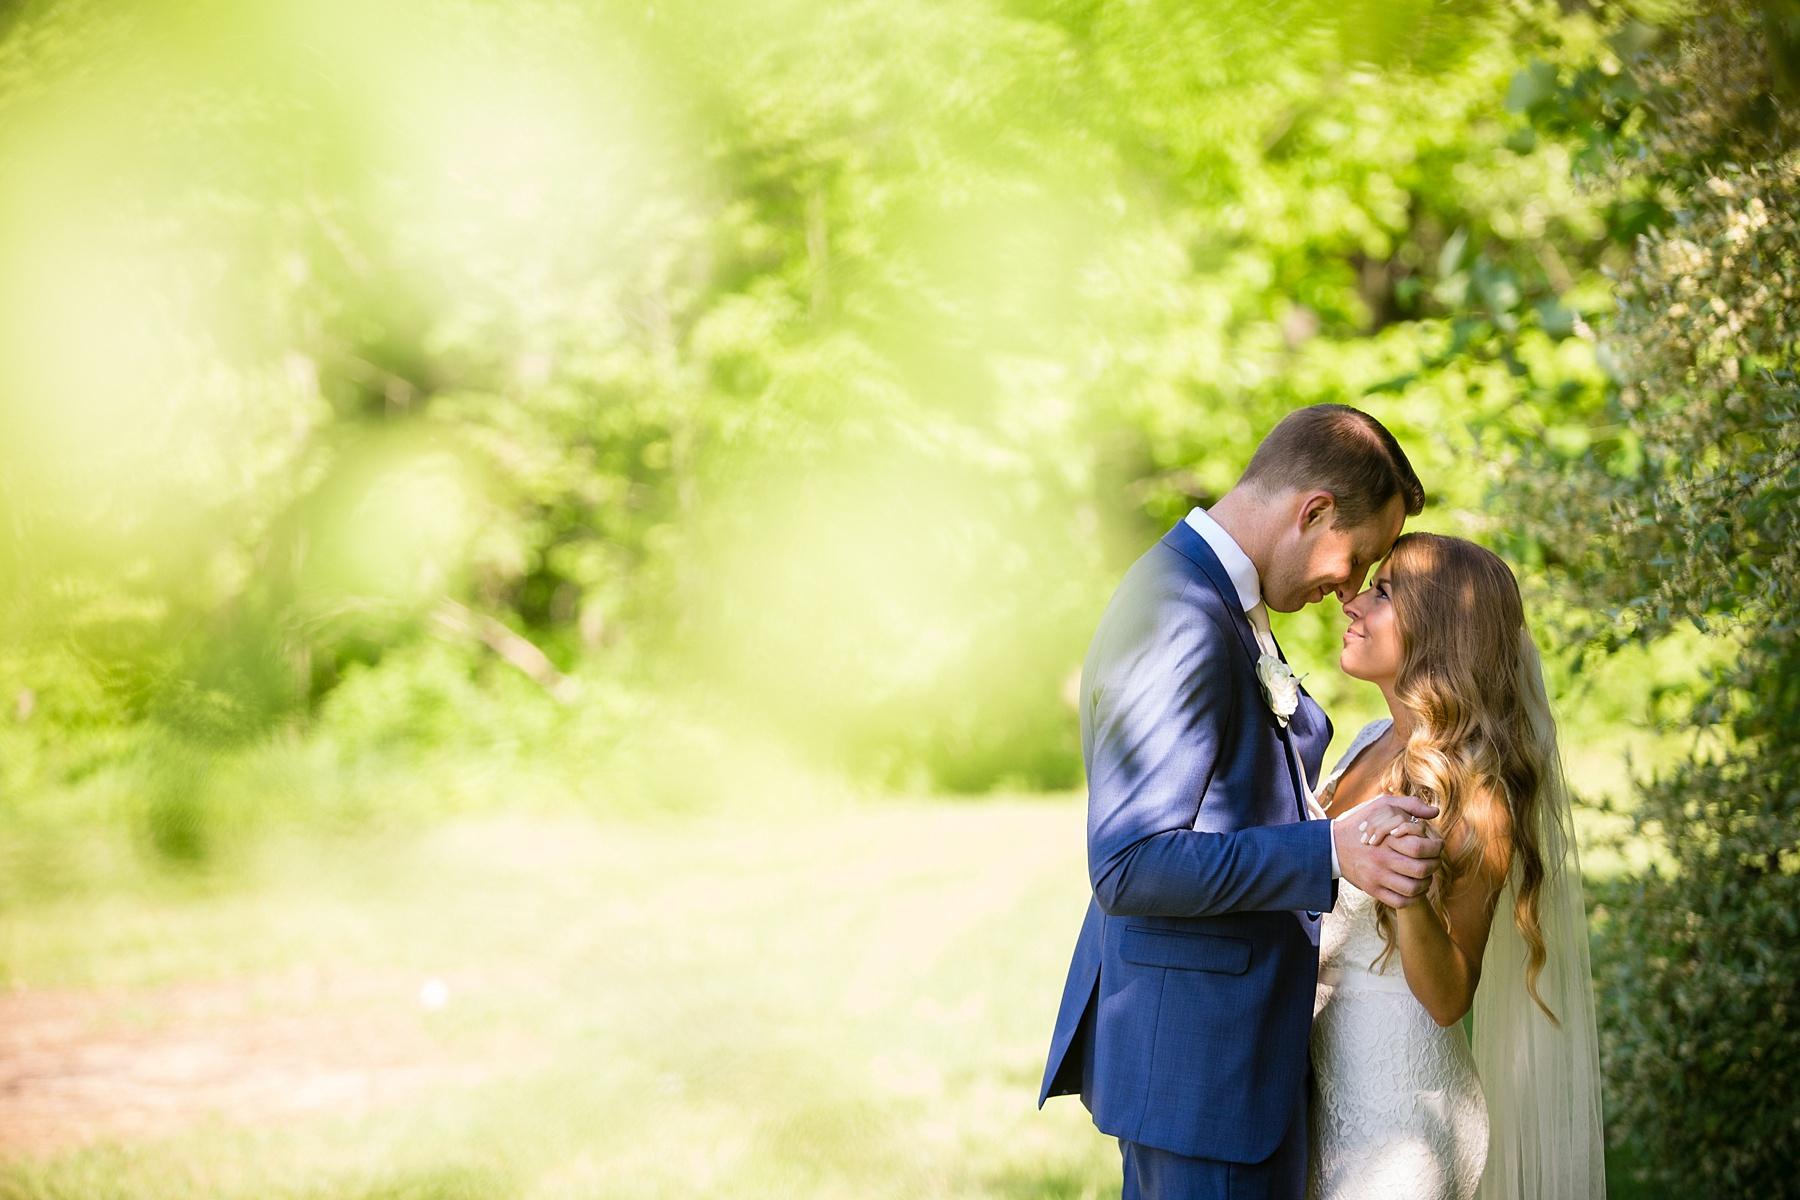 Brandon_Shafer_Photography_Kara_Doug_12_corners_Wedding_Benton_Harbor_0049.jpg